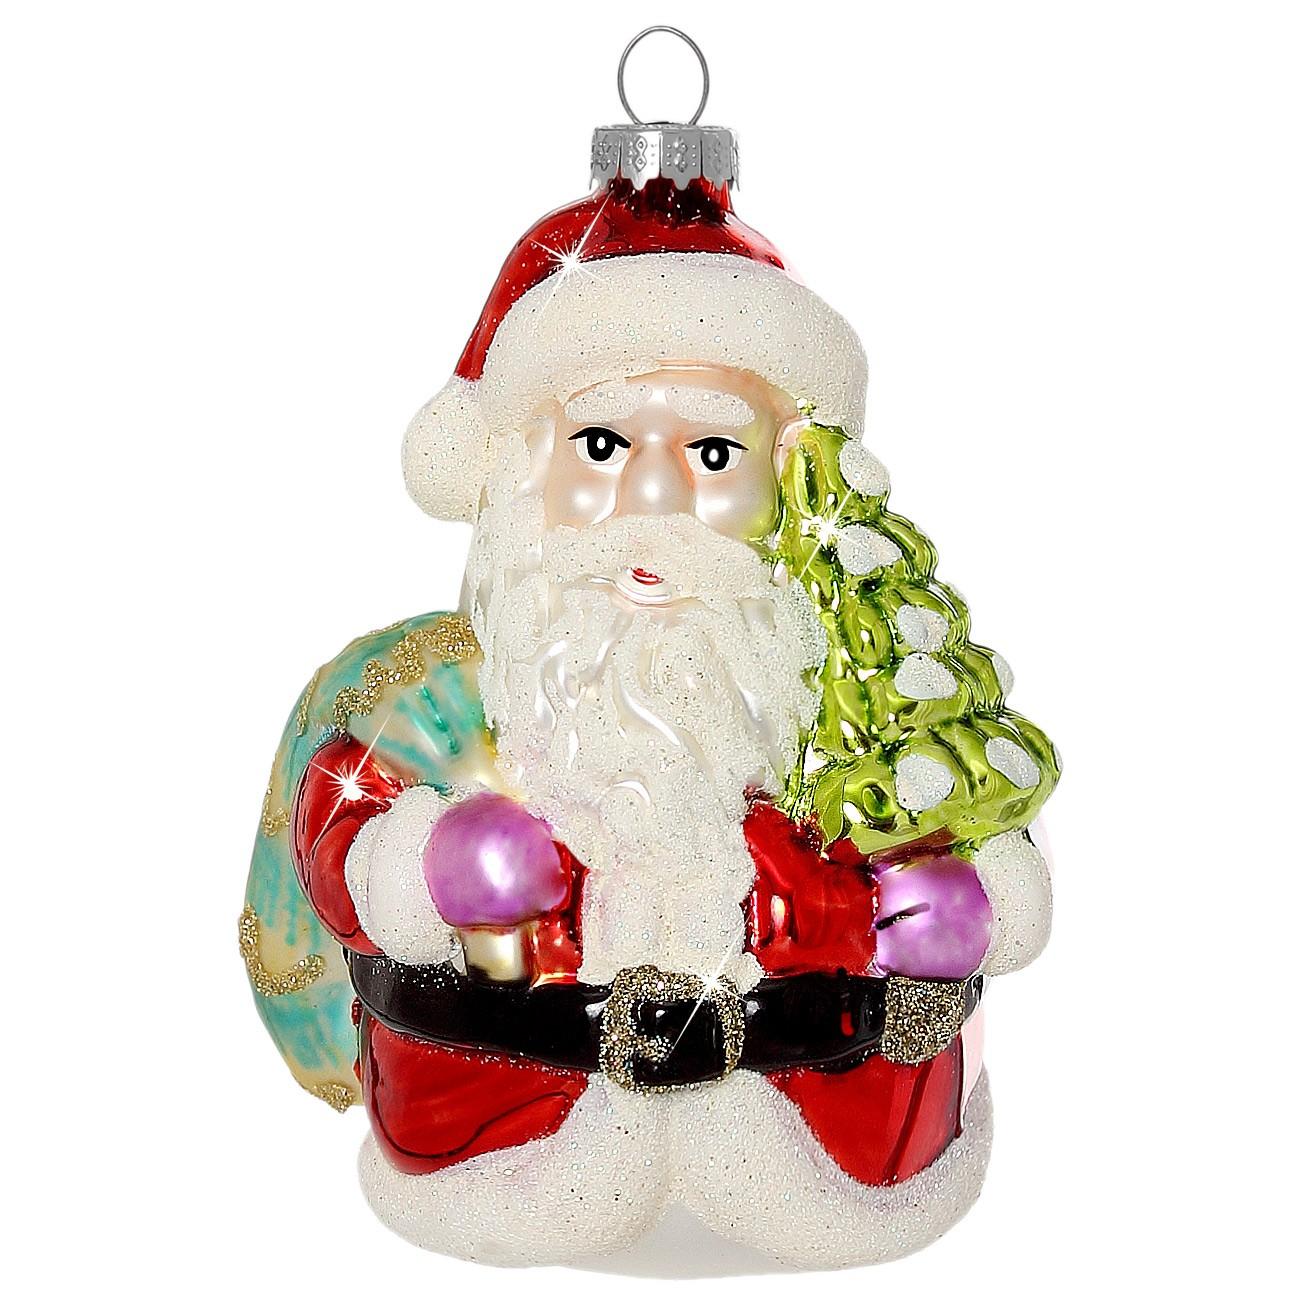 sikora christbaumschmuck glas ornament weihnachtsmann h 10cm christbaumschmuck coloriertes glas. Black Bedroom Furniture Sets. Home Design Ideas